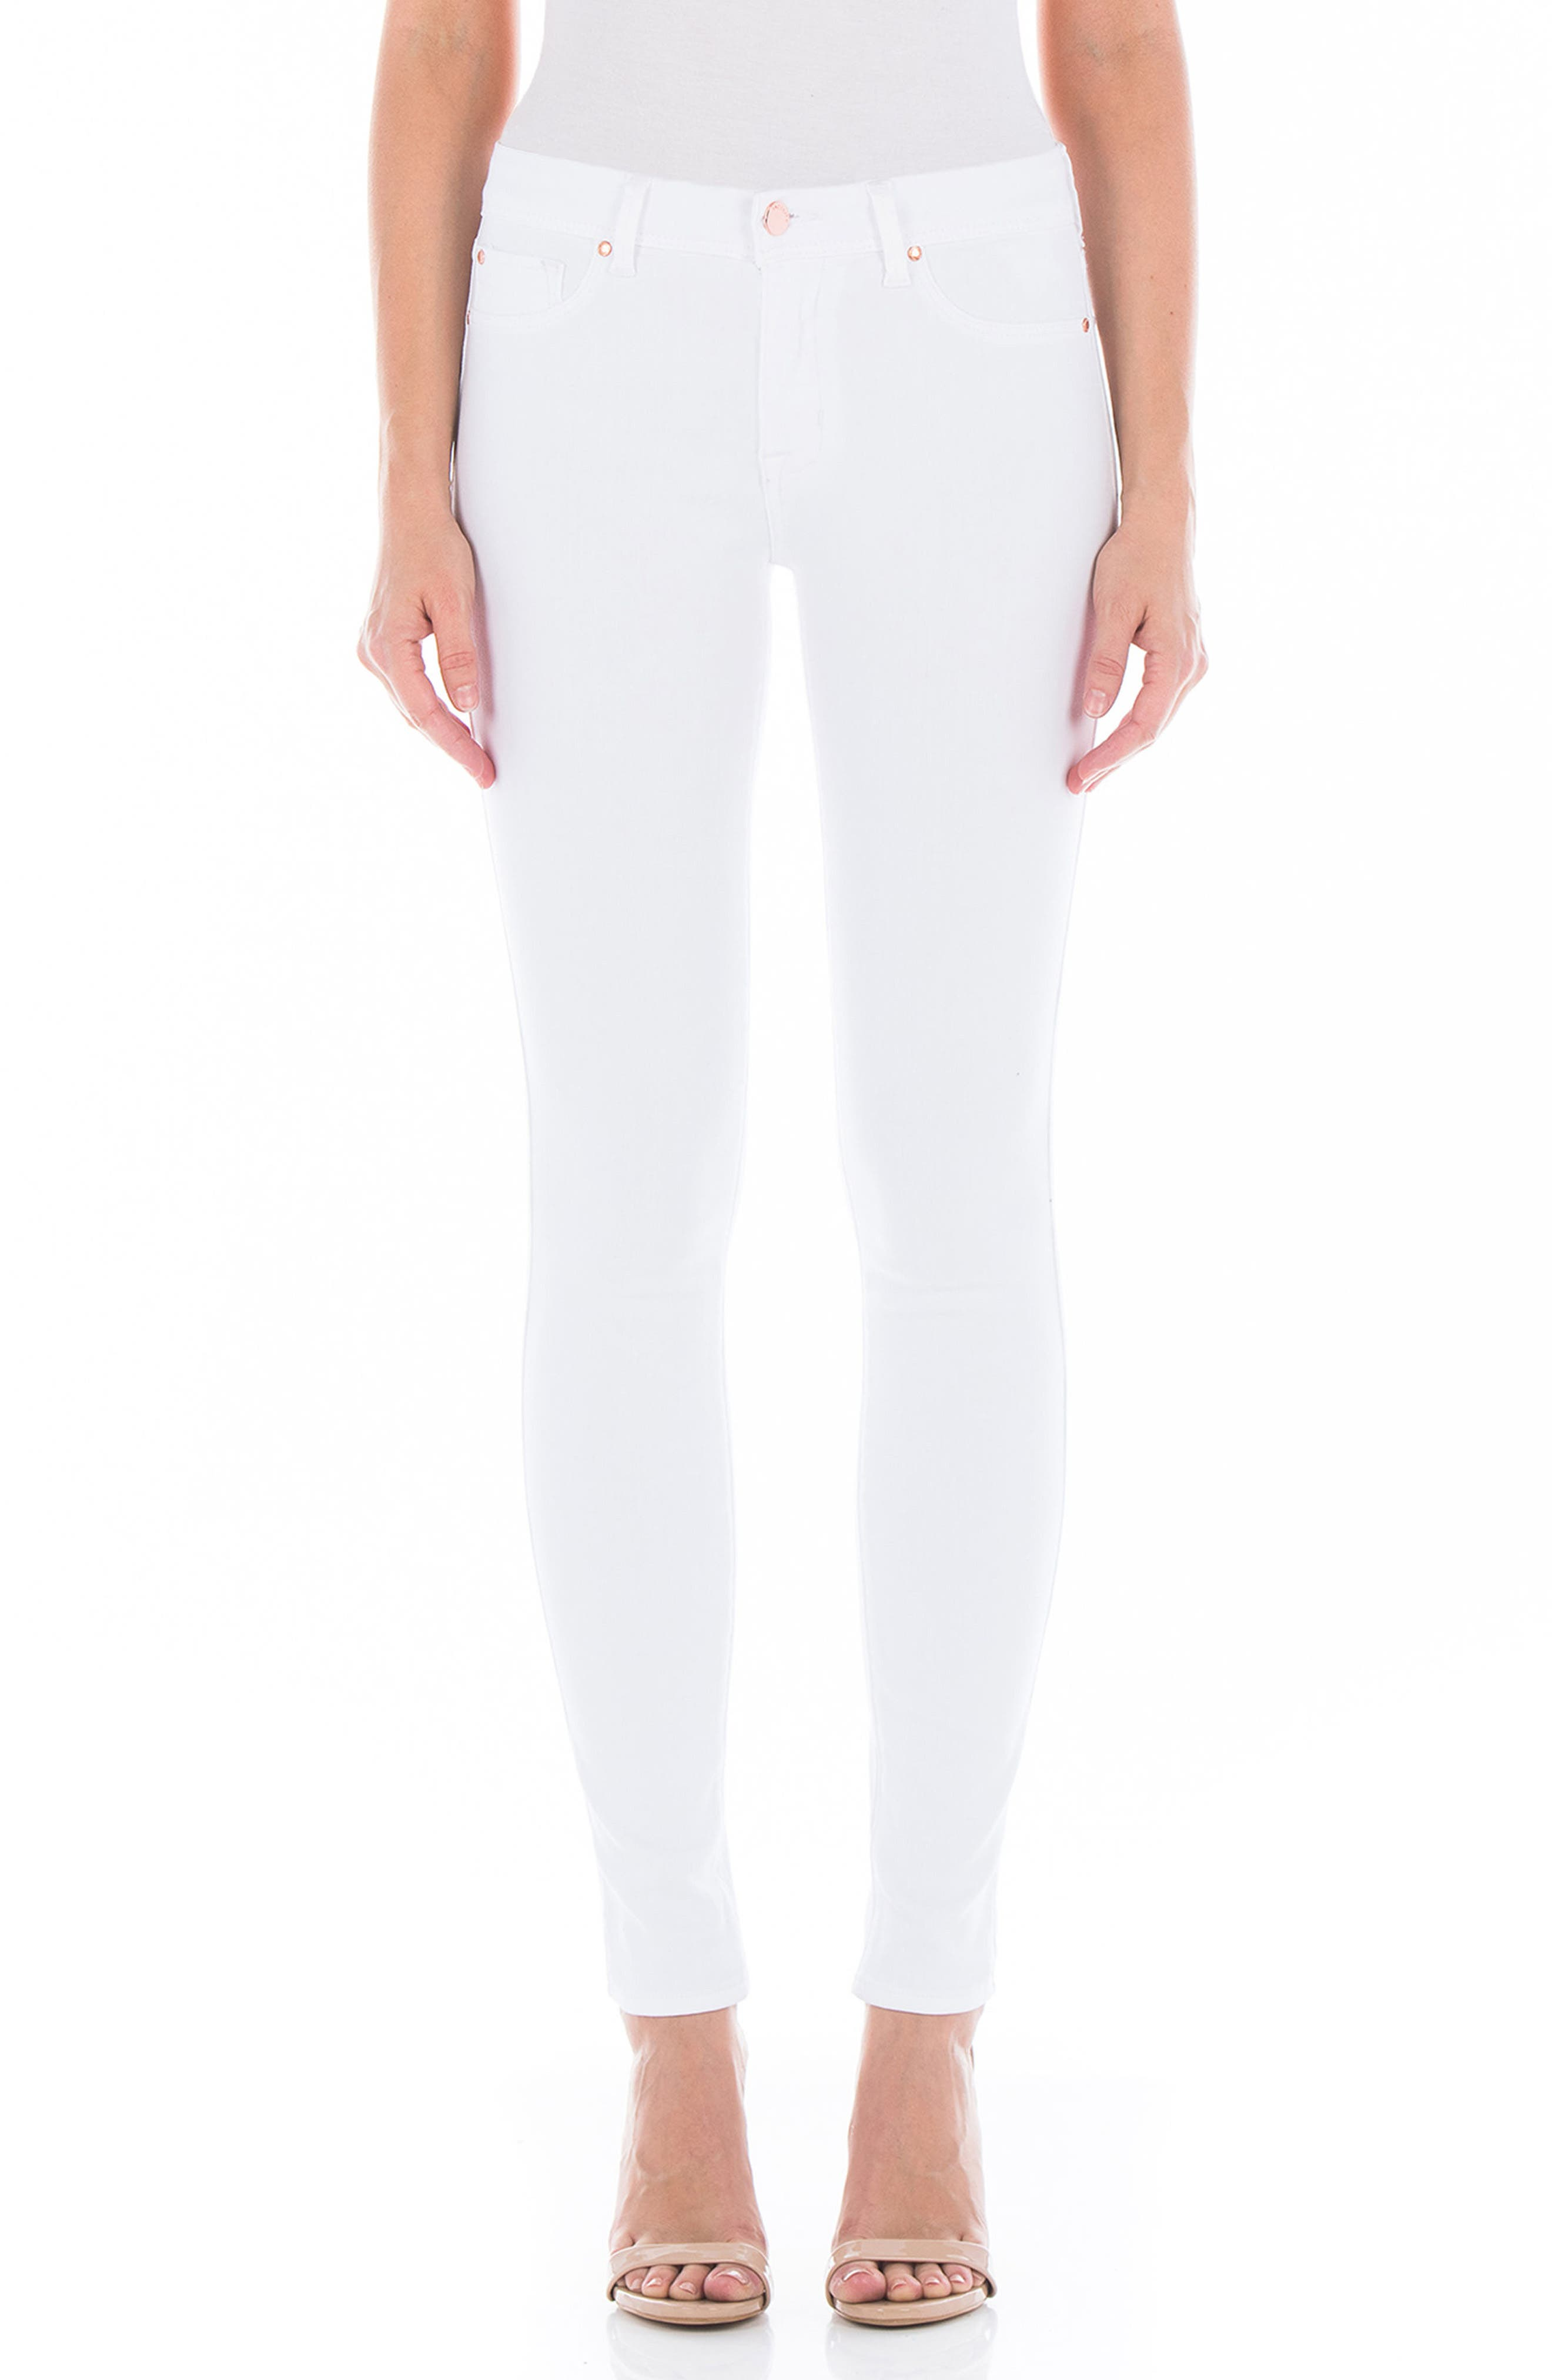 Belvedere Skinny Jeans,                             Main thumbnail 1, color,                             WHITE